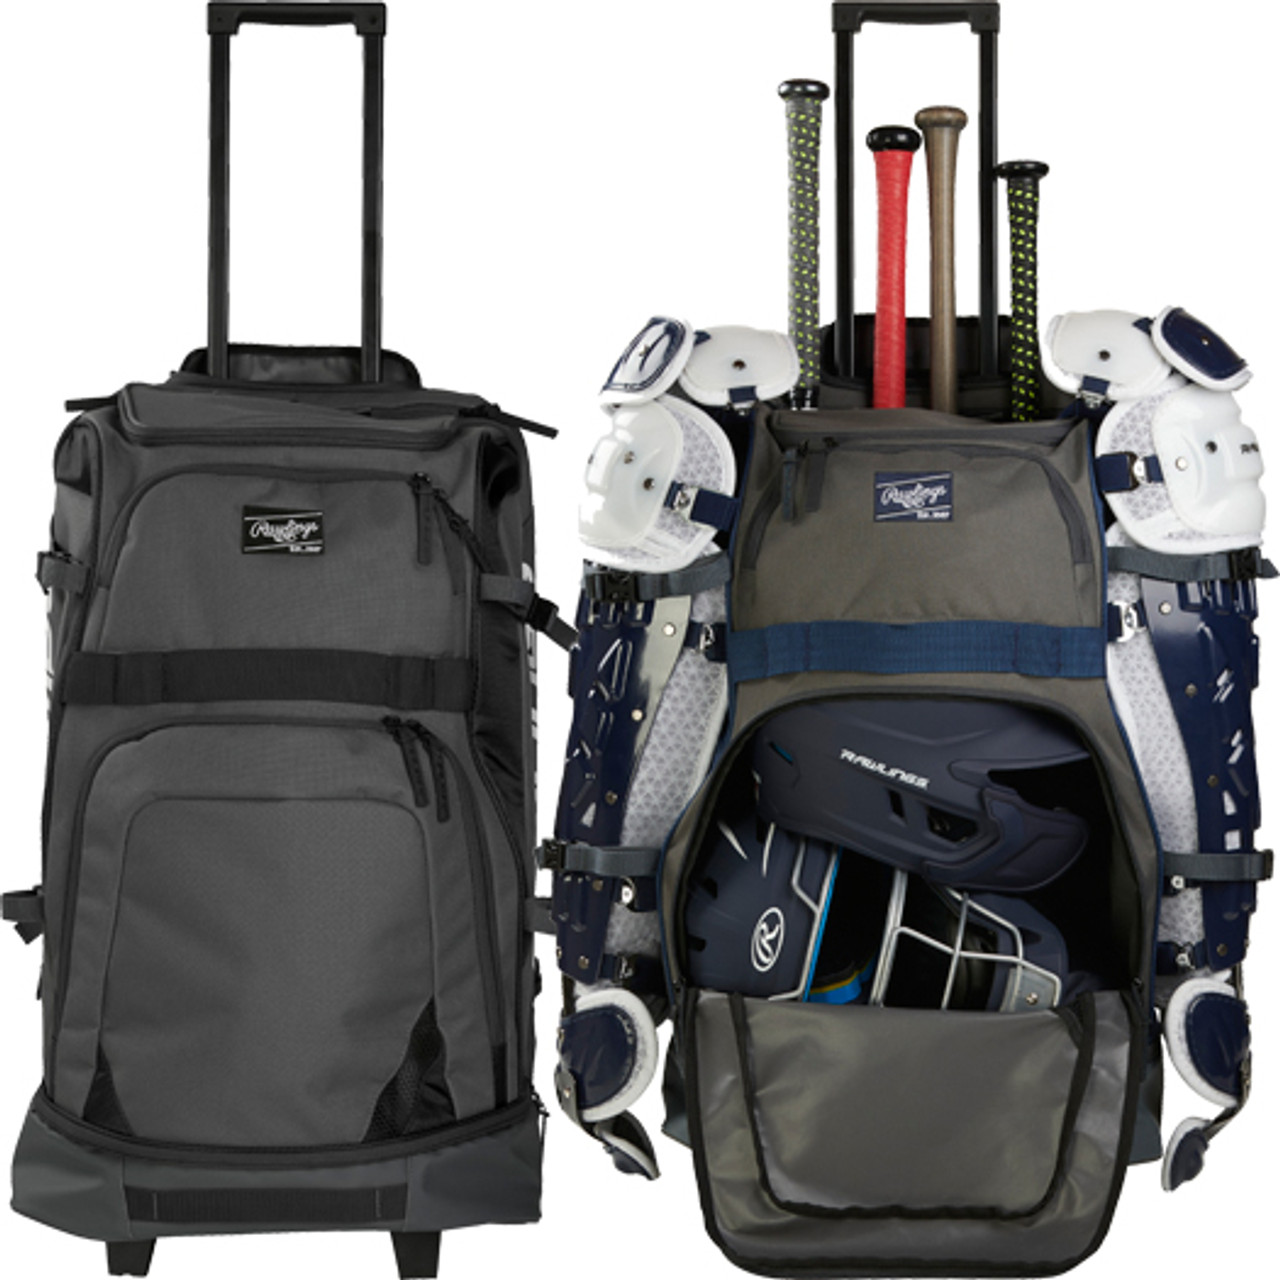 Rawlings Wheeled Catchers Backpack Baseball Softball Catchers Equipment Bag R1801